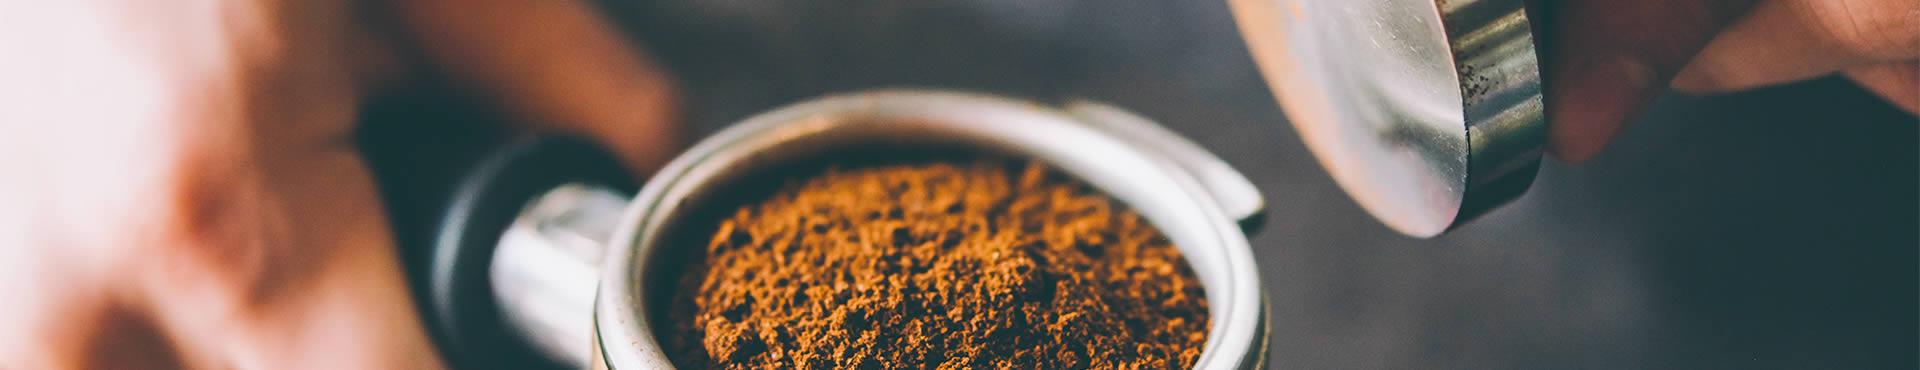 Coffee School | Coffee Course